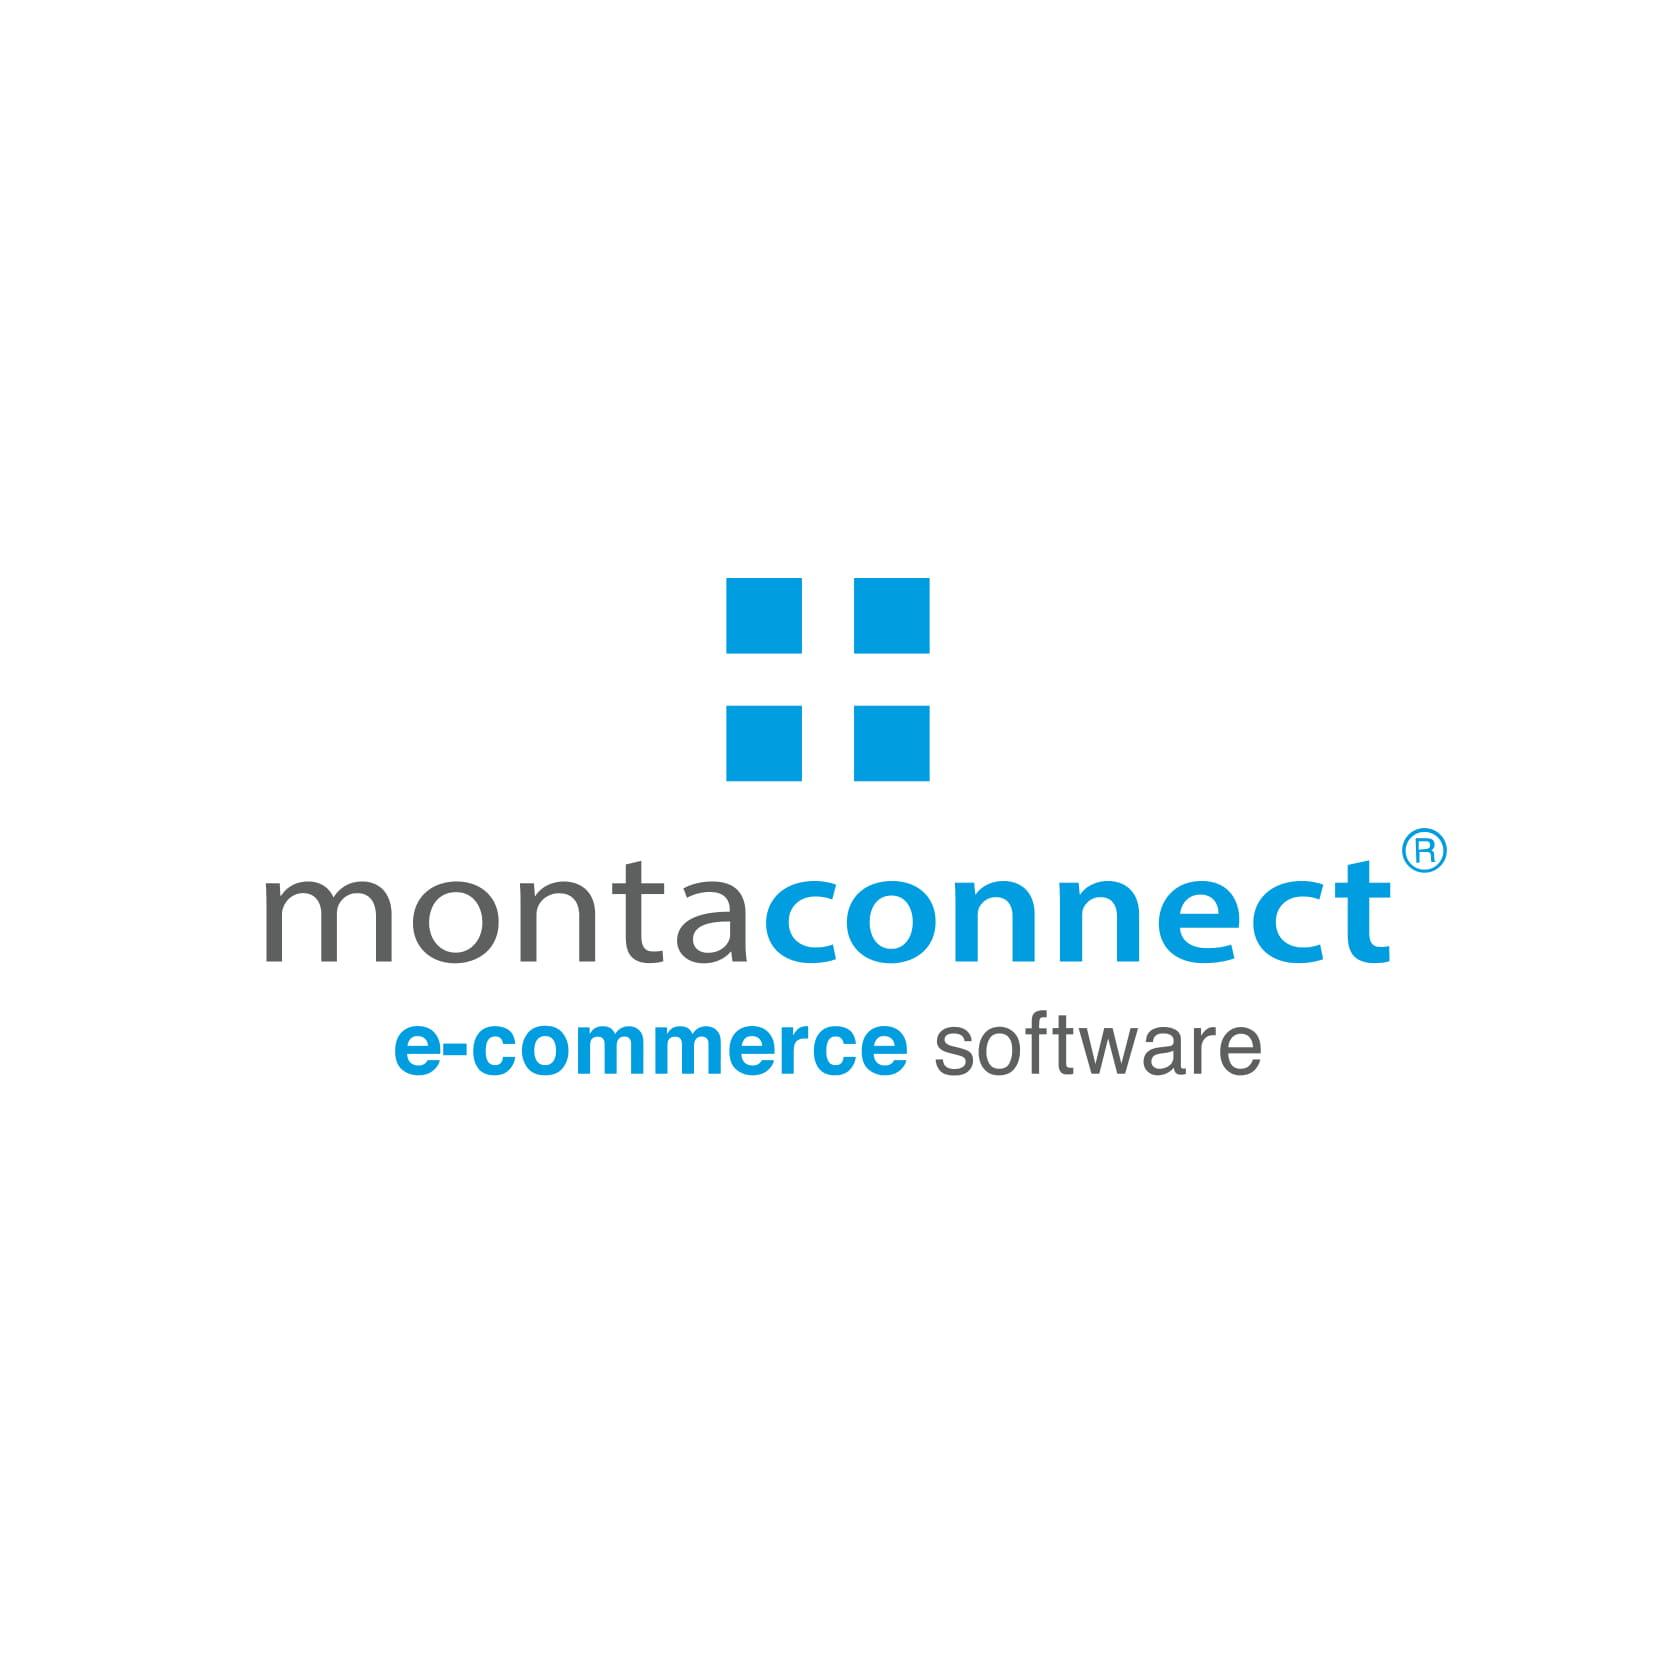 MontaConnect